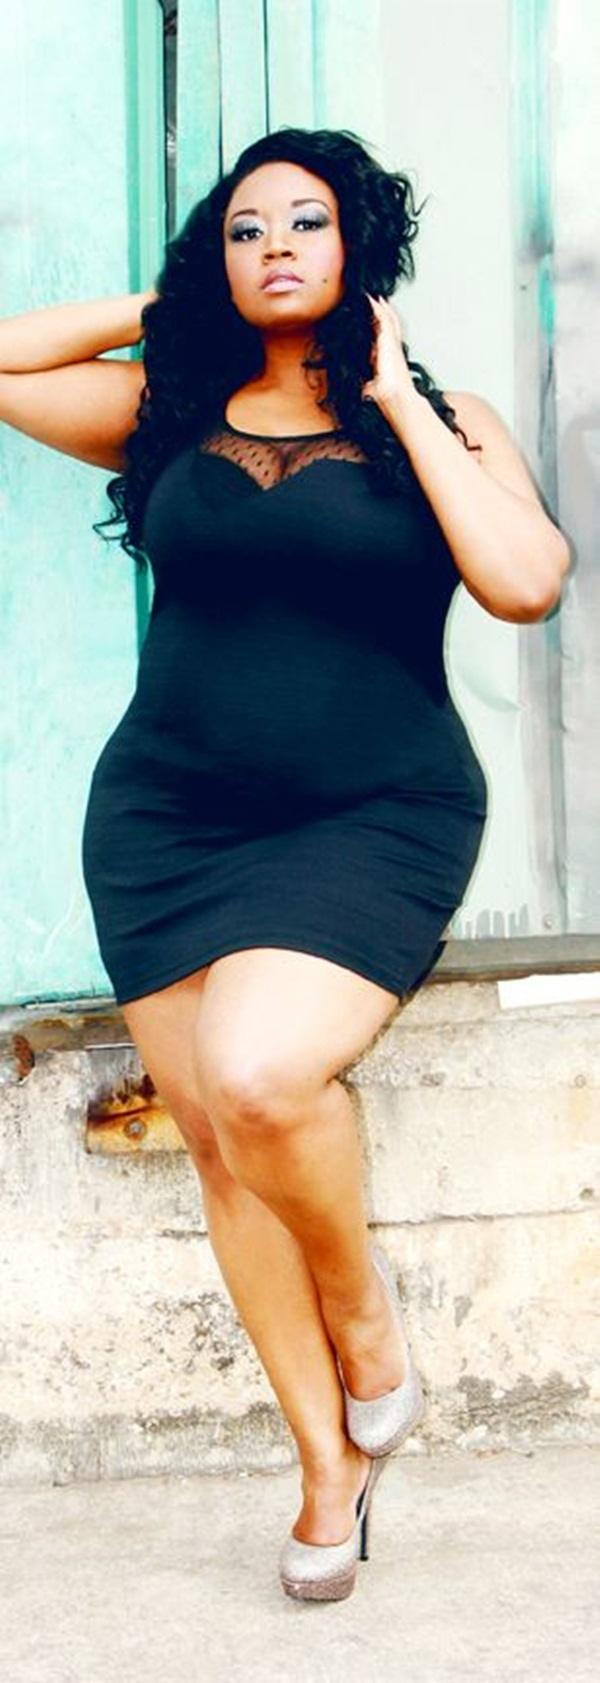 Ebony bbw nude pics 82